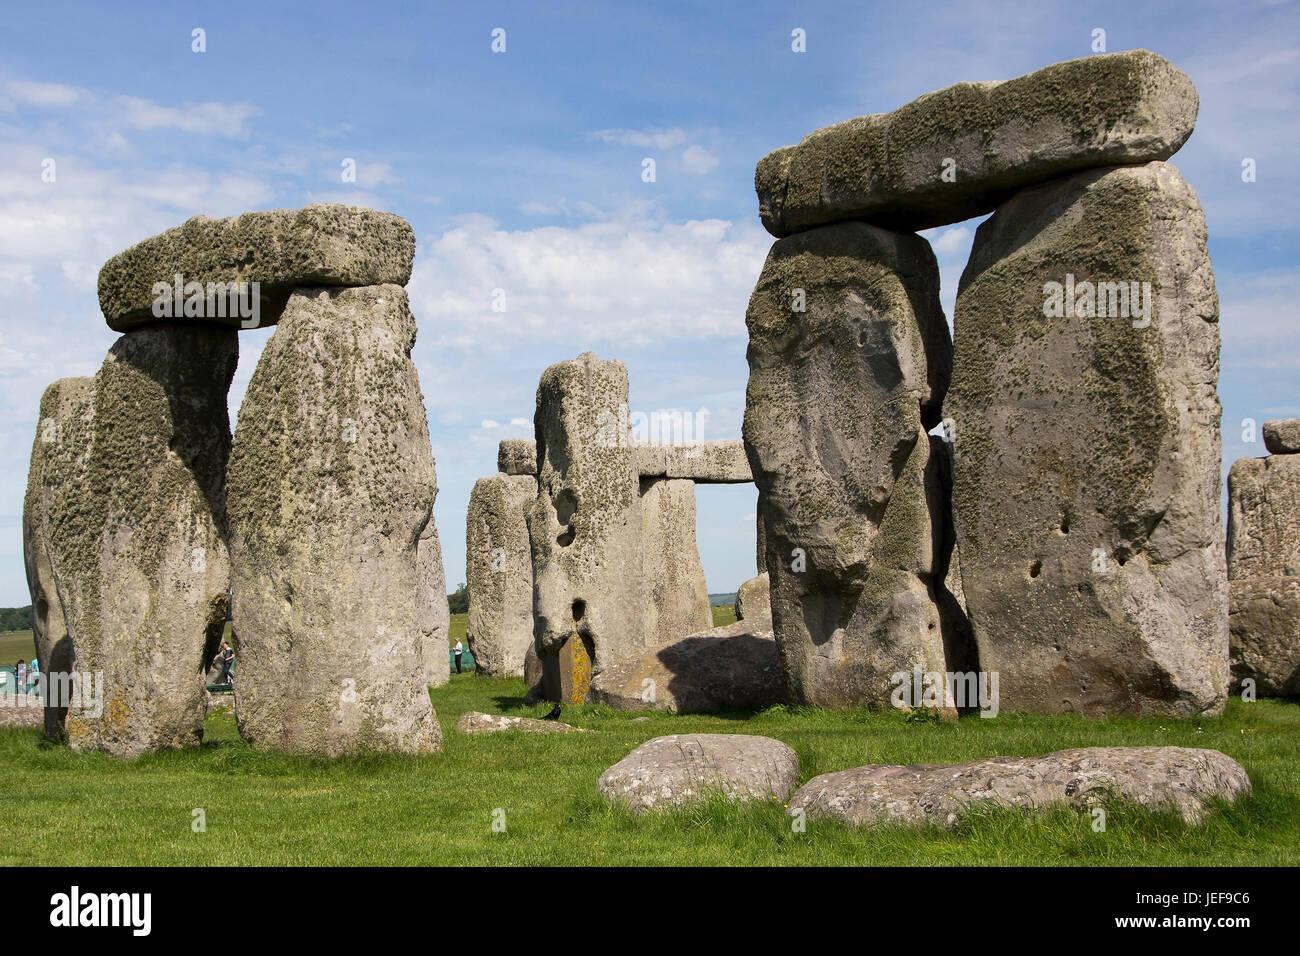 Stonehenge, Wiltshire, Gran Bretagna, Grossbritannien Immagini Stock